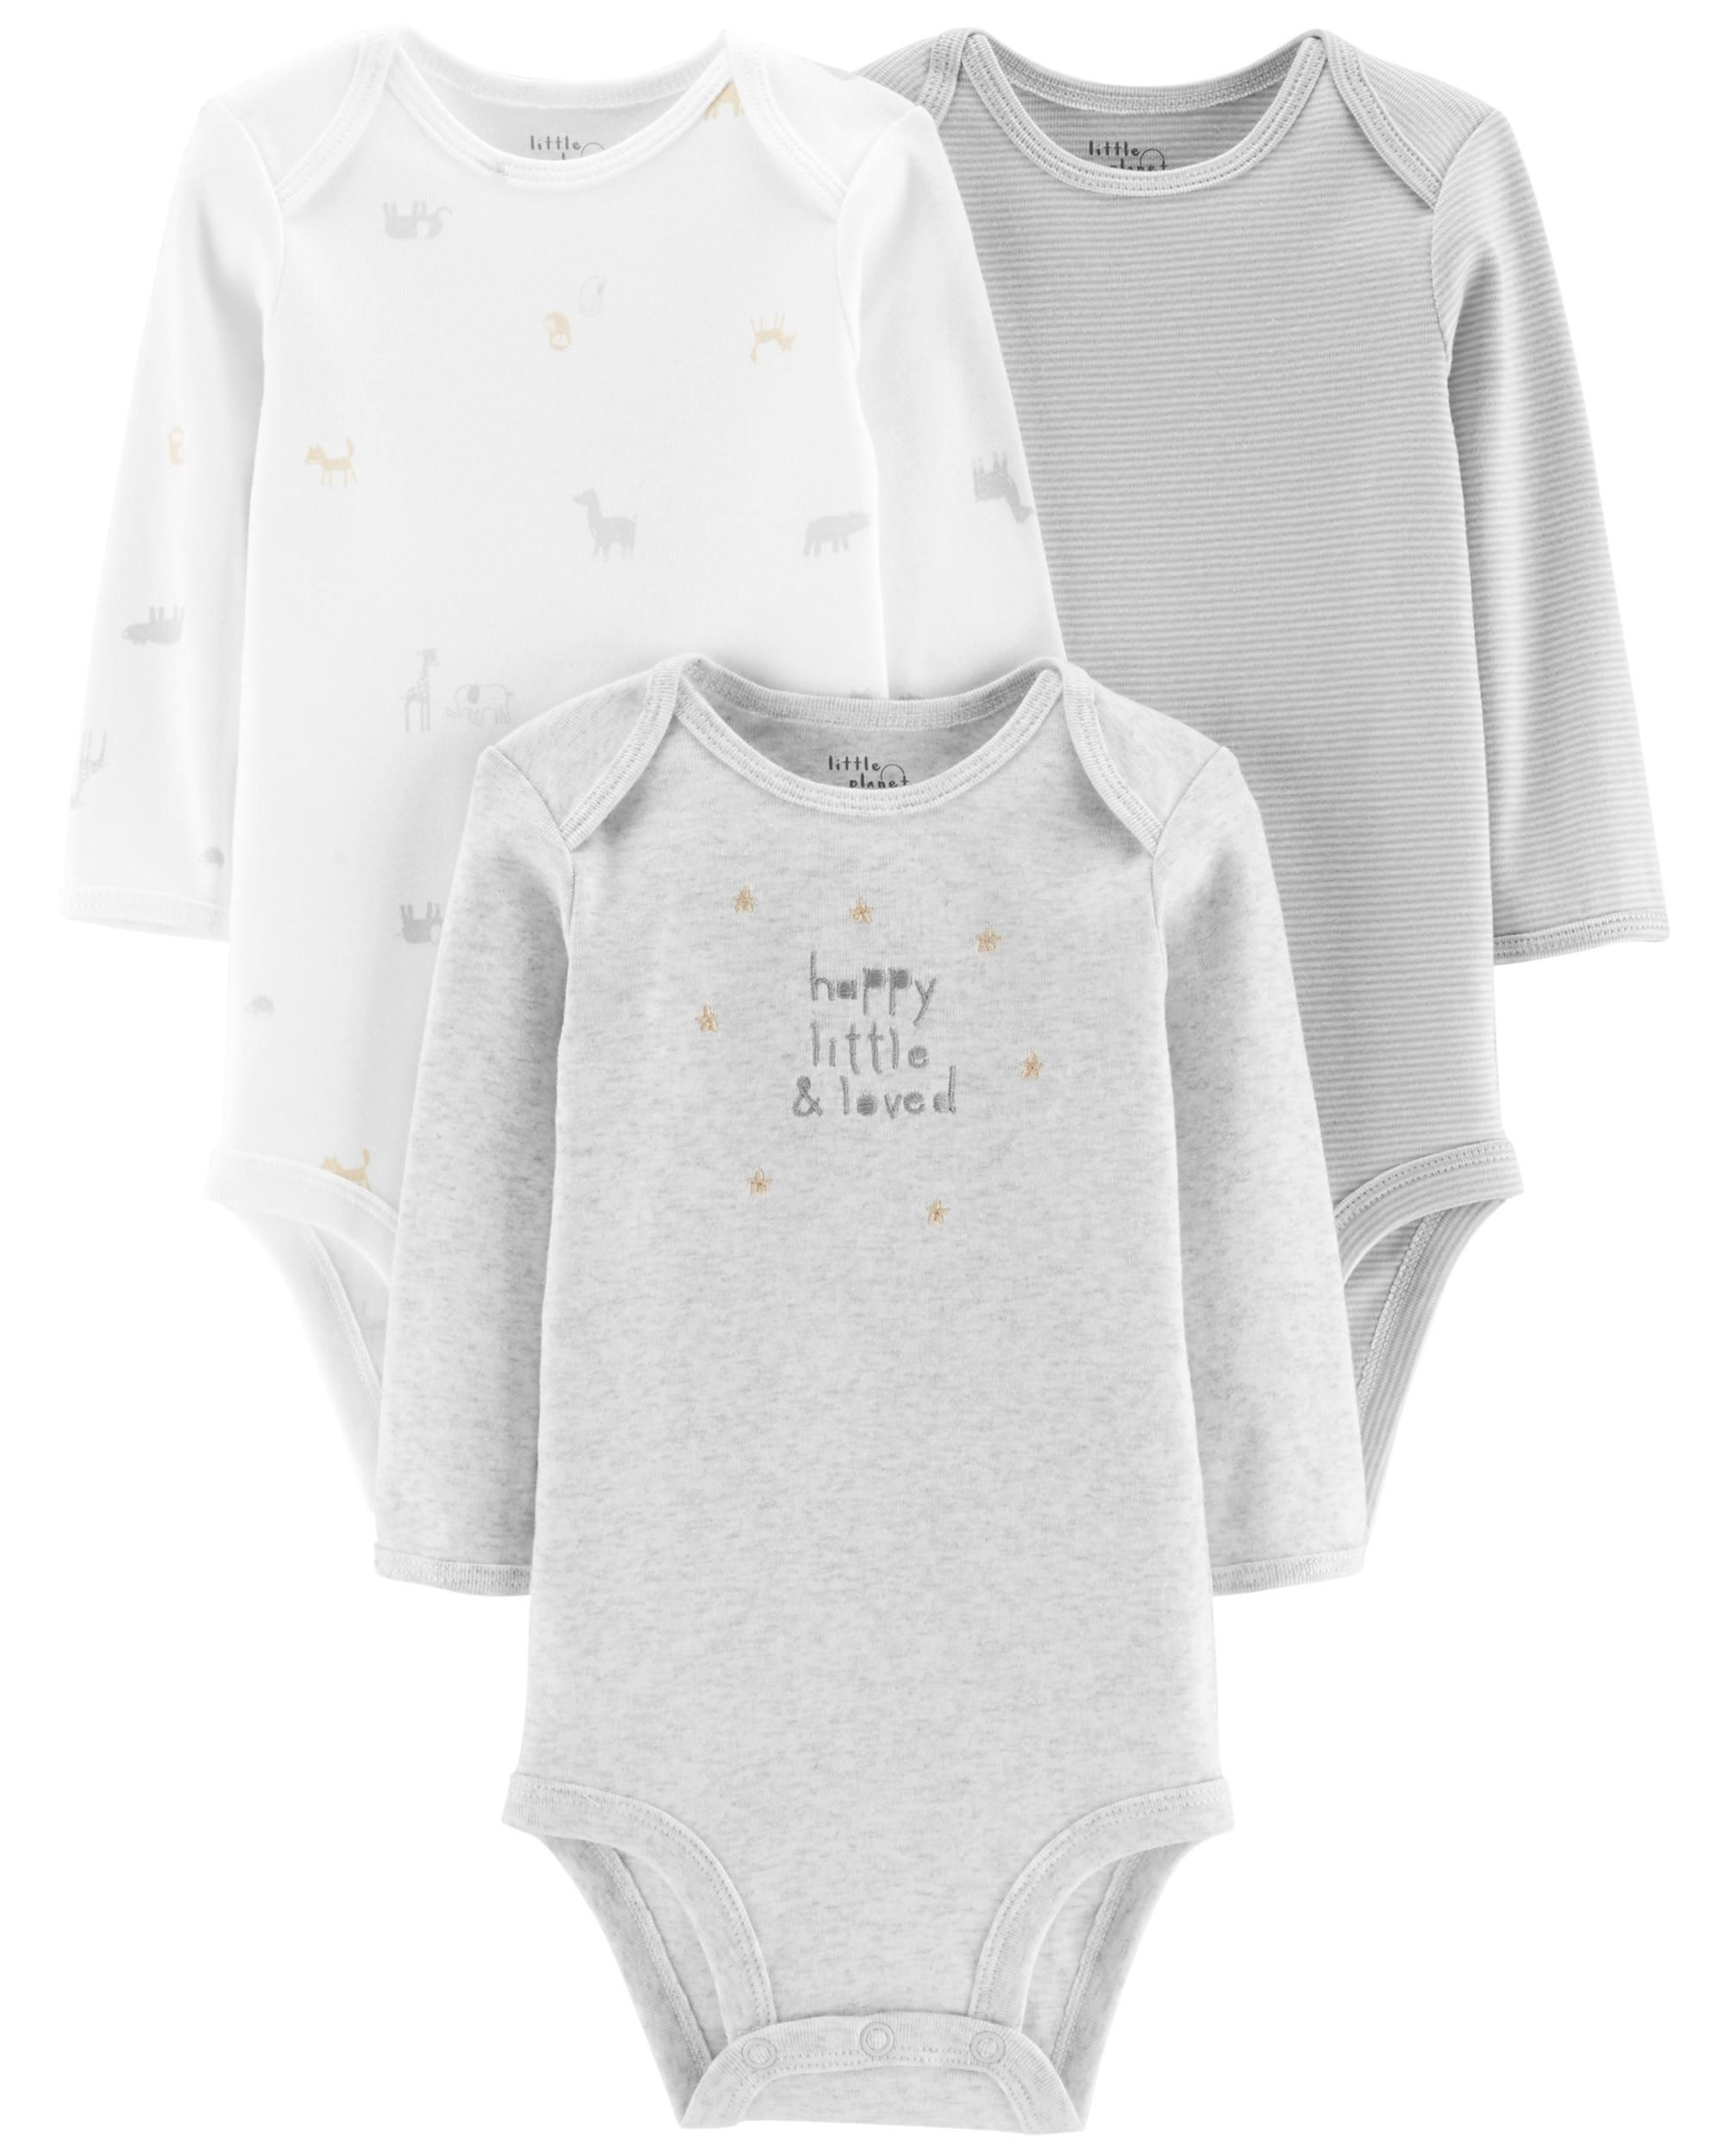 6f6e43c5c8ef Baby Boy - 3-Pack Certified Organic Bodysuits -  26.00